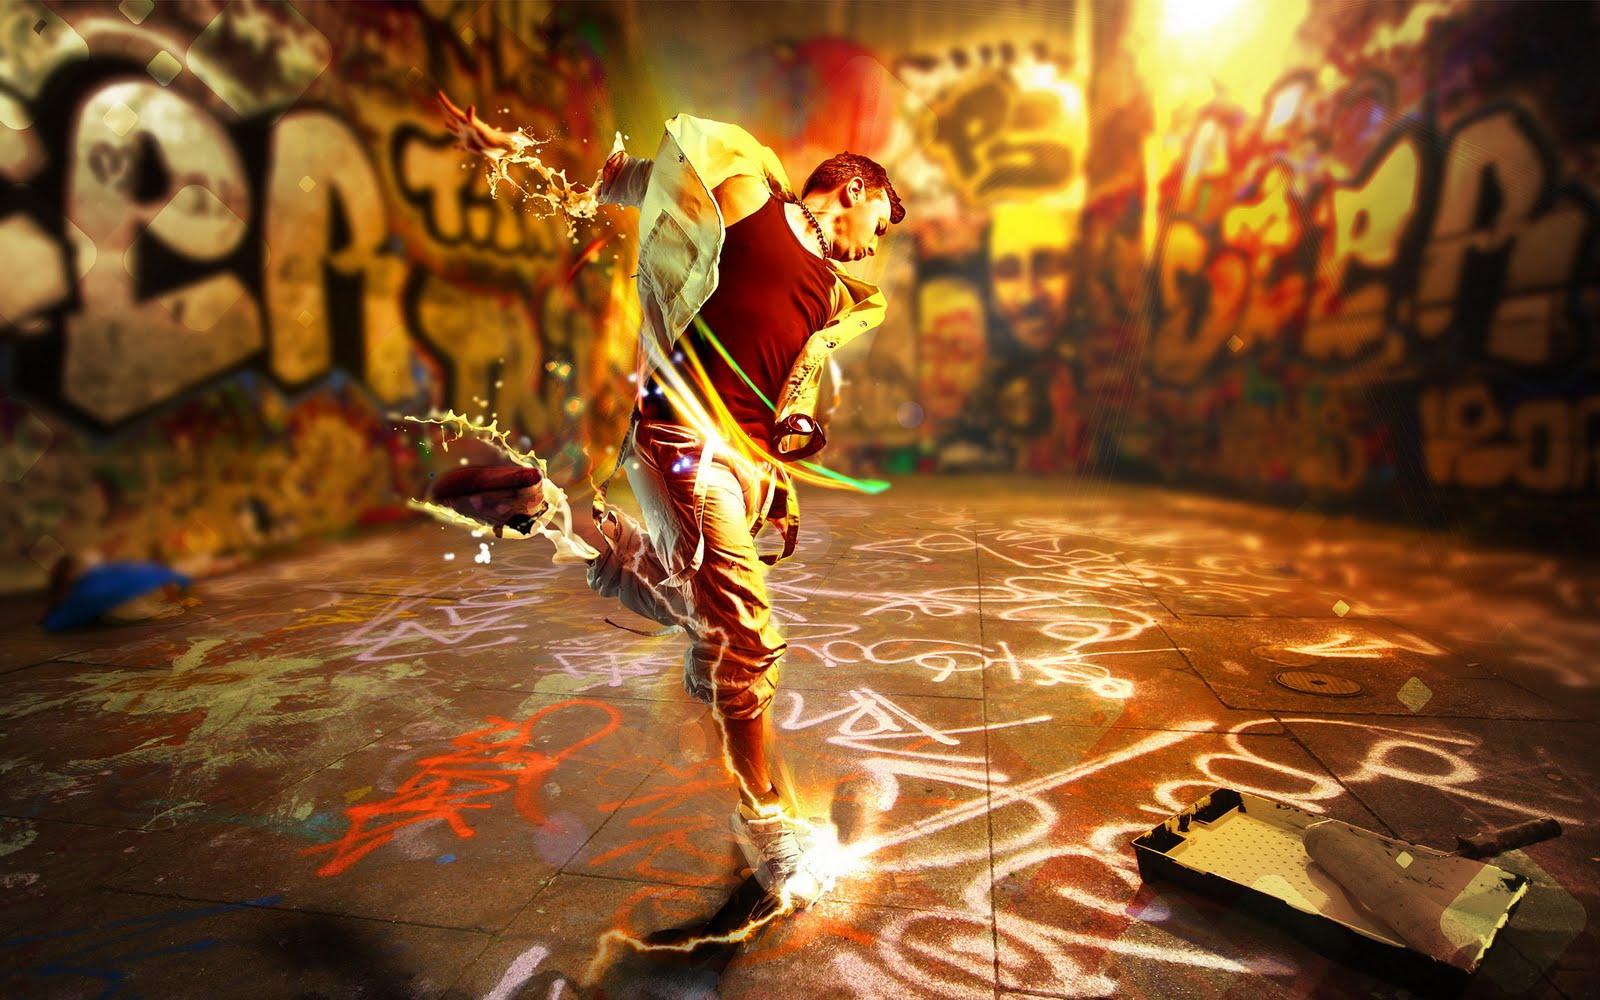 http://3.bp.blogspot.com/-6v8SGwskzNY/TfuYnHOwKJI/AAAAAAAAAEU/DWsIRgVQTP4/s1600/Dance+HD+Wallpaper.jpg